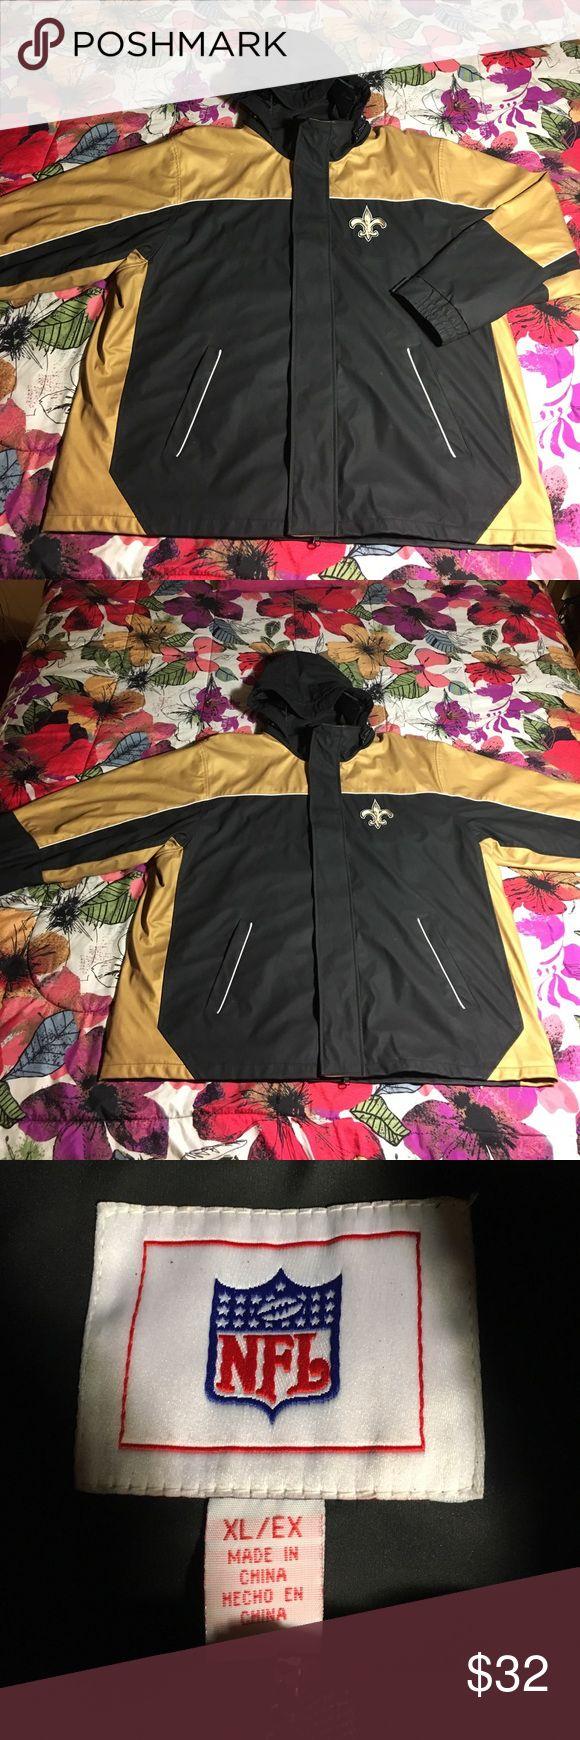 New Orlean Saints NFL Football Jacket x Coat Great NFL brand saints jacket - Size XL - Condition just about like new NFL Jackets & Coats